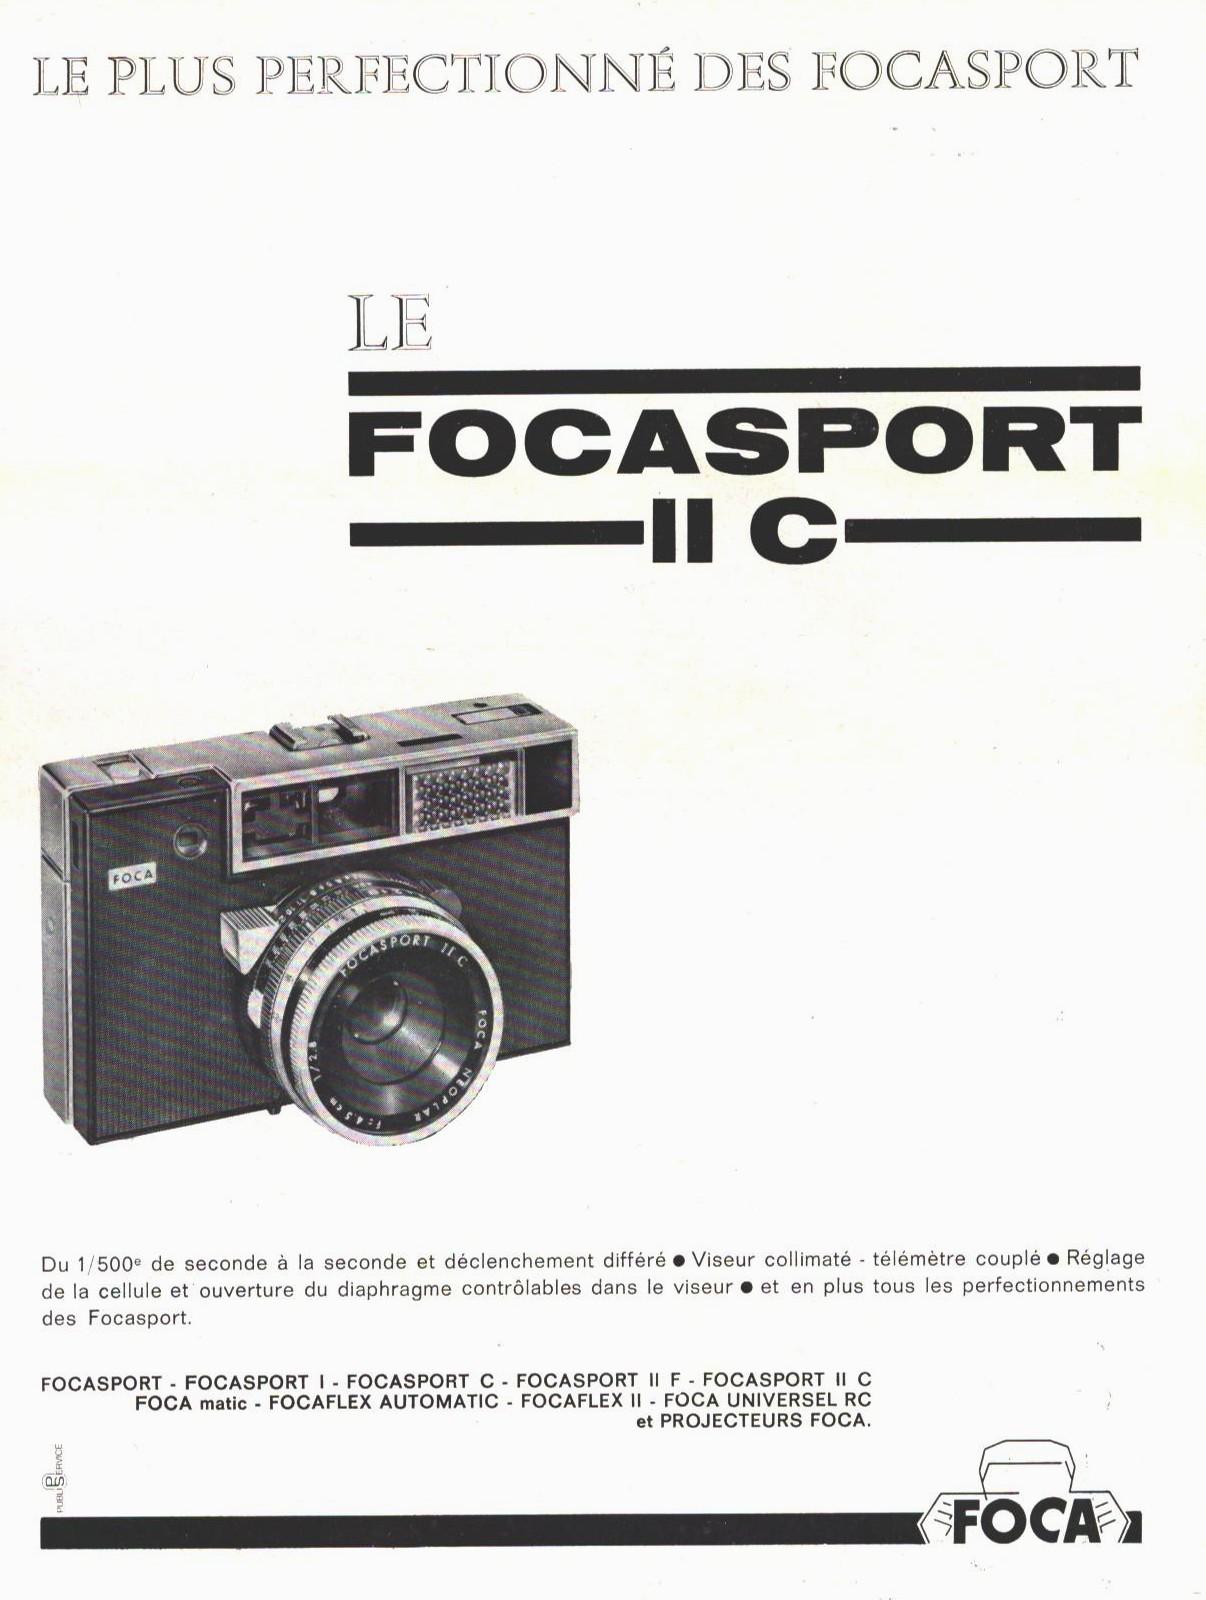 Wallpaper 1582-02 OPL Focasport IIC, collection AMI Appareils photos